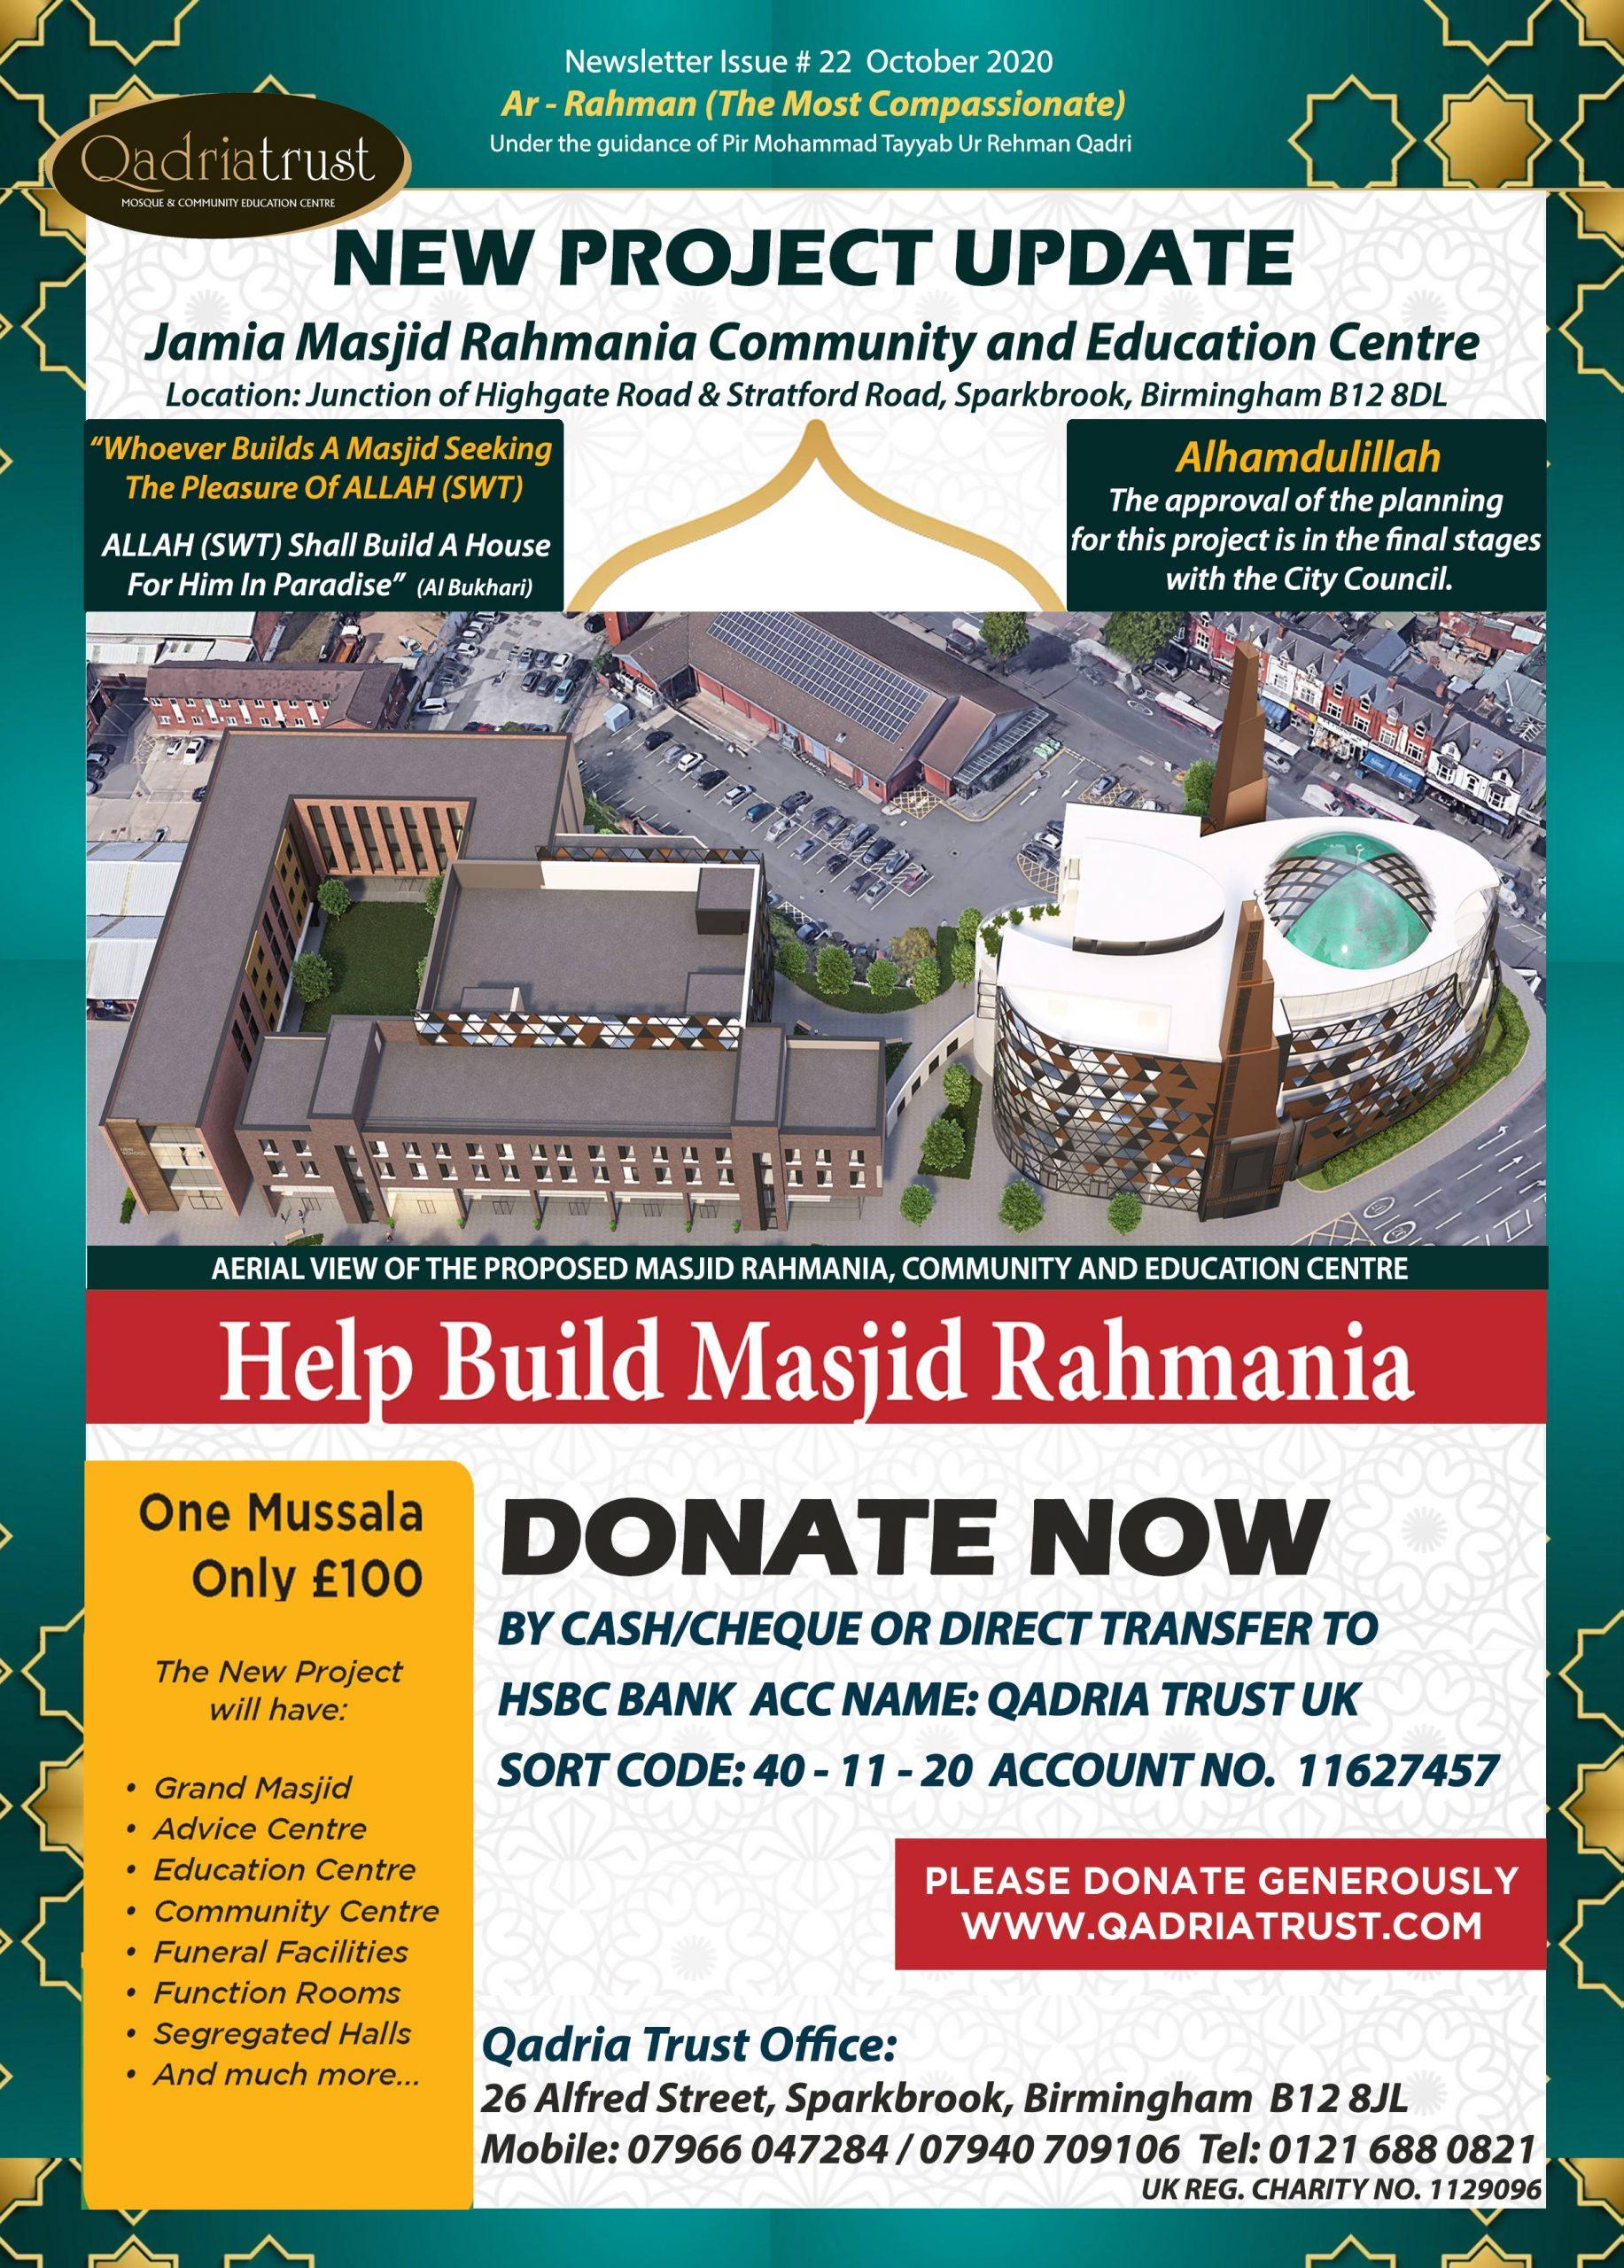 Urgent Donation Appeal